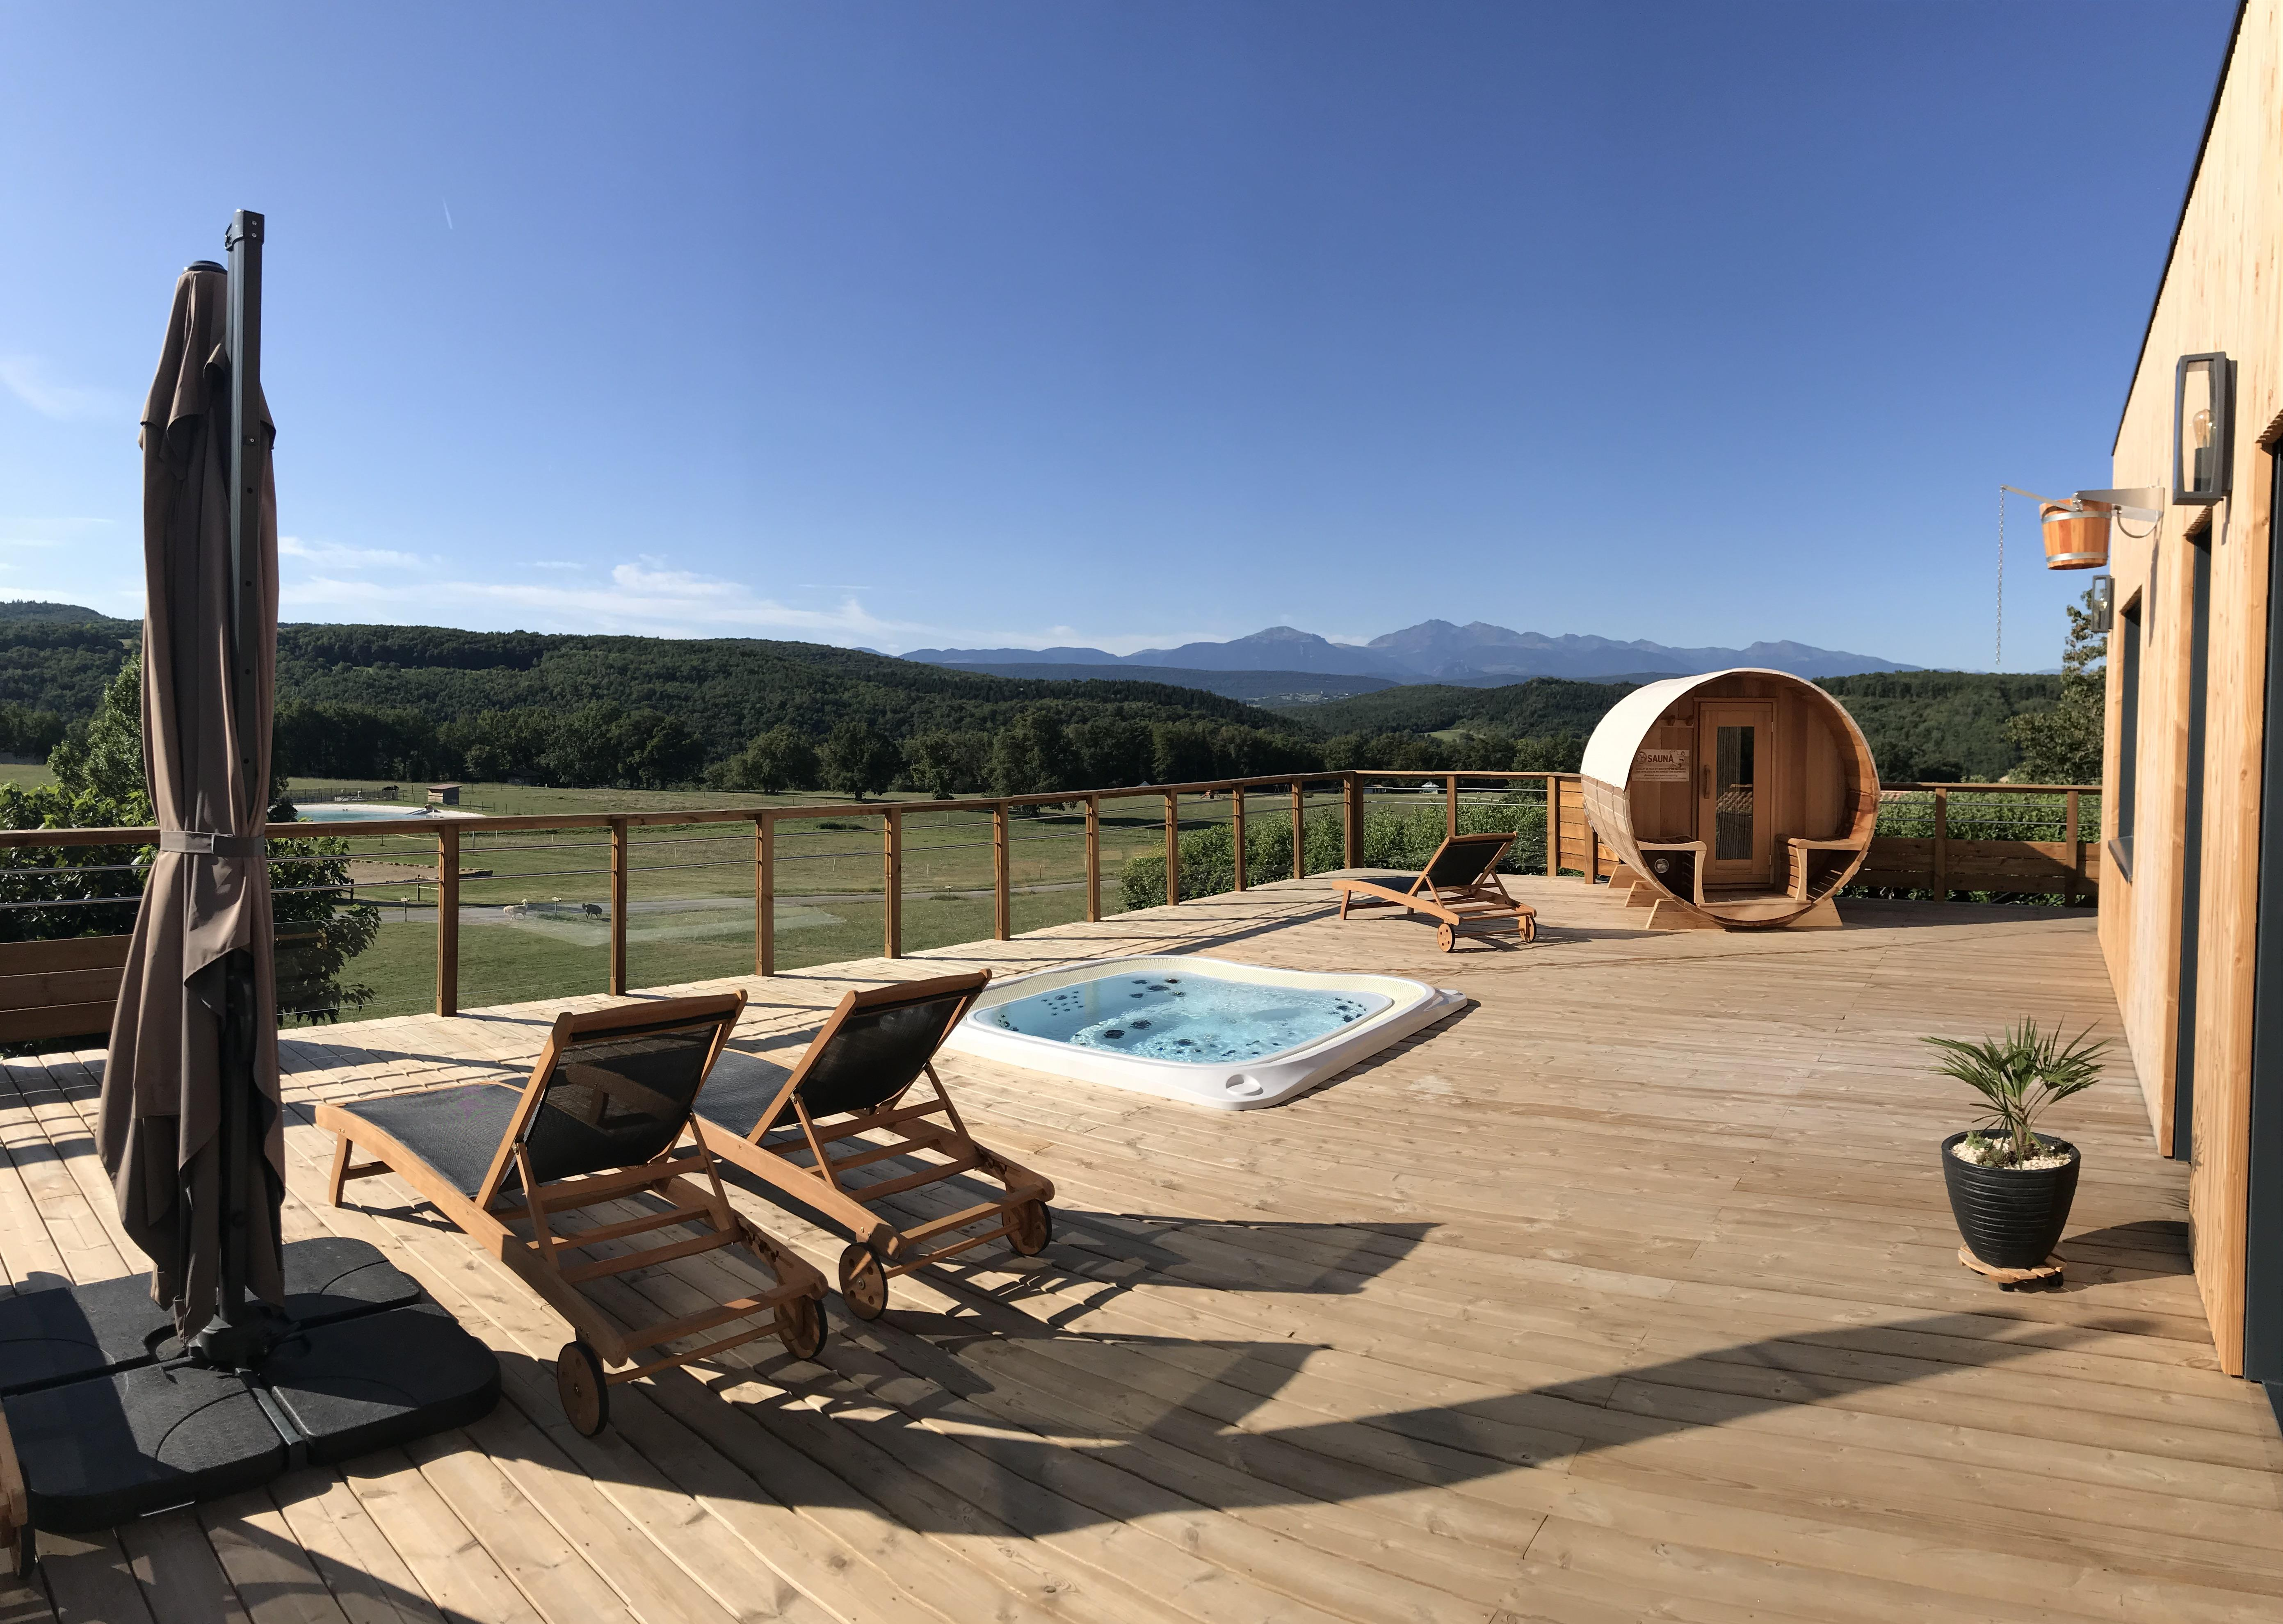 Camping la Ferme la Besse, Camon, Ariège